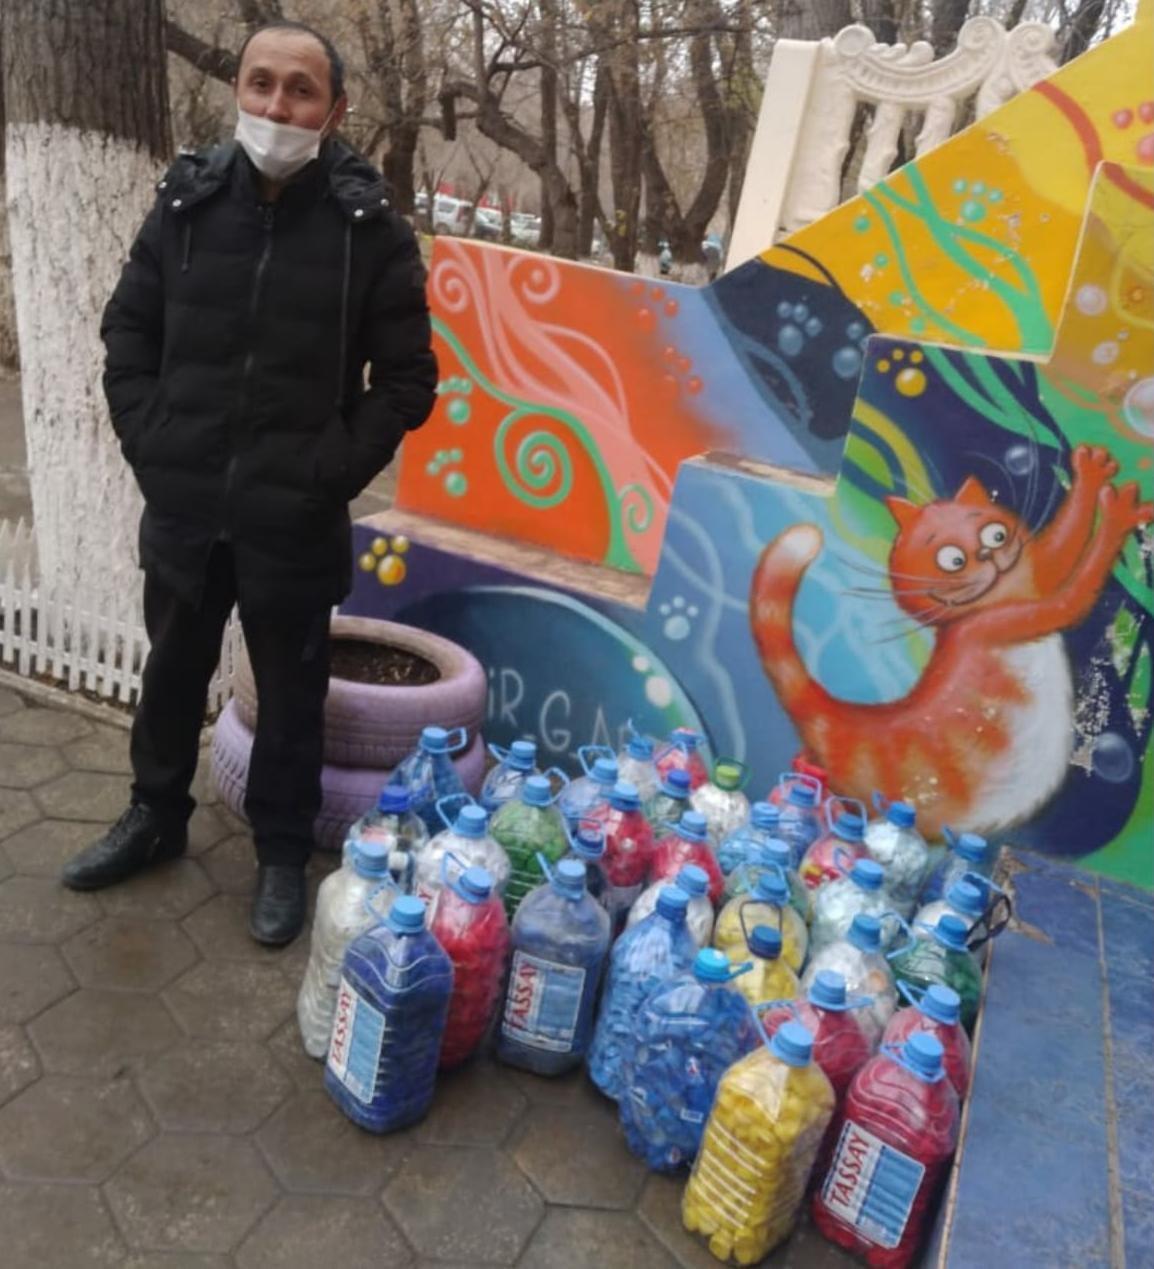 помимо крышек собирают пластиковые бутылки, фото акимата Карагандинской области